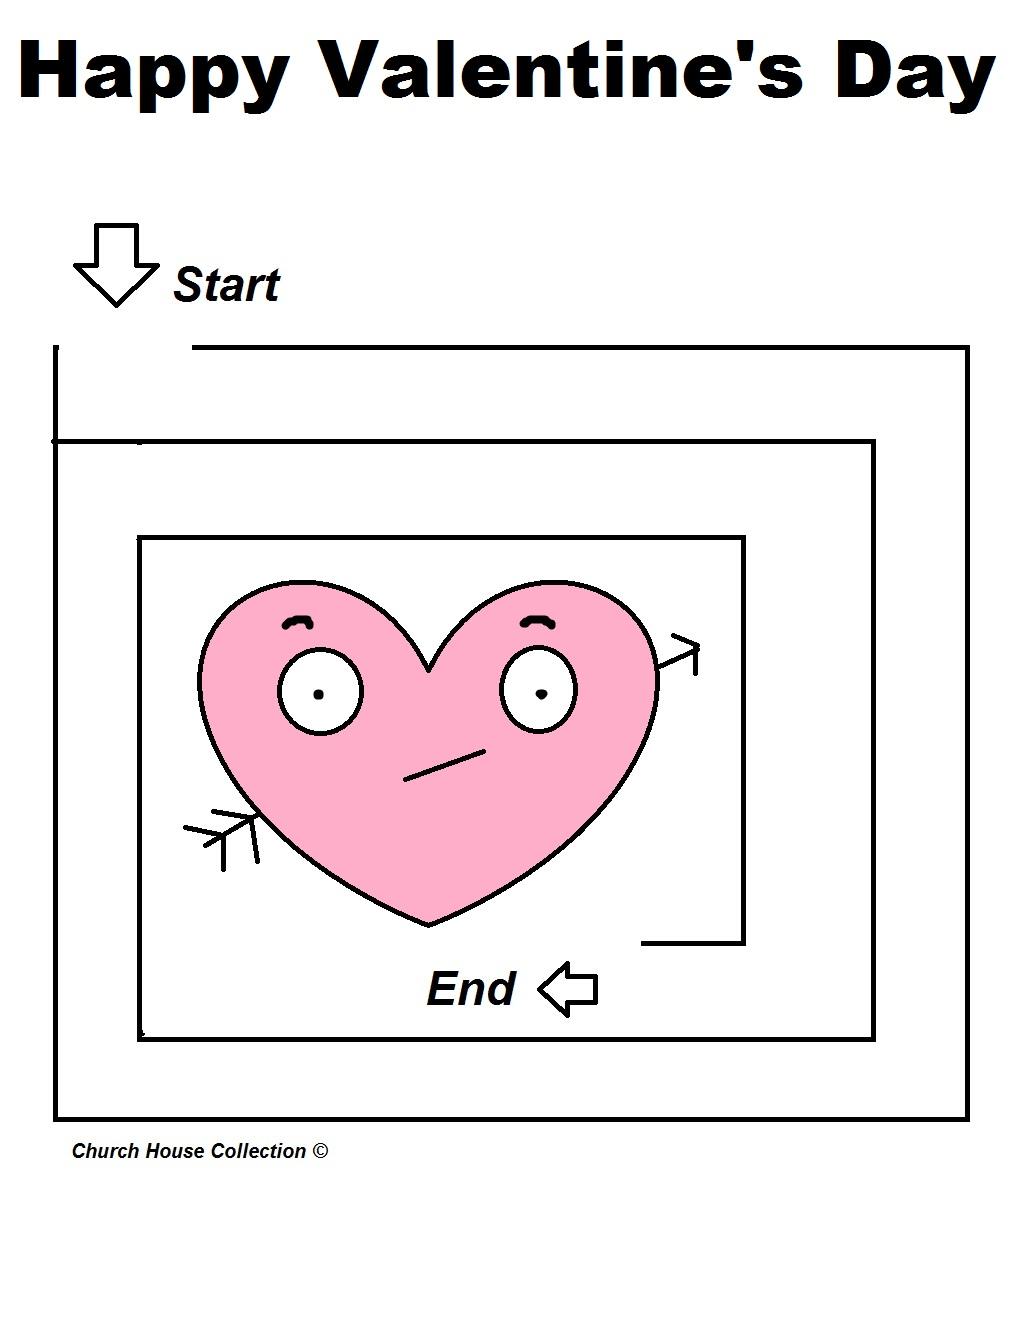 Uncategorized Valentine Mazes valentines day heart maze quotes mazes for school